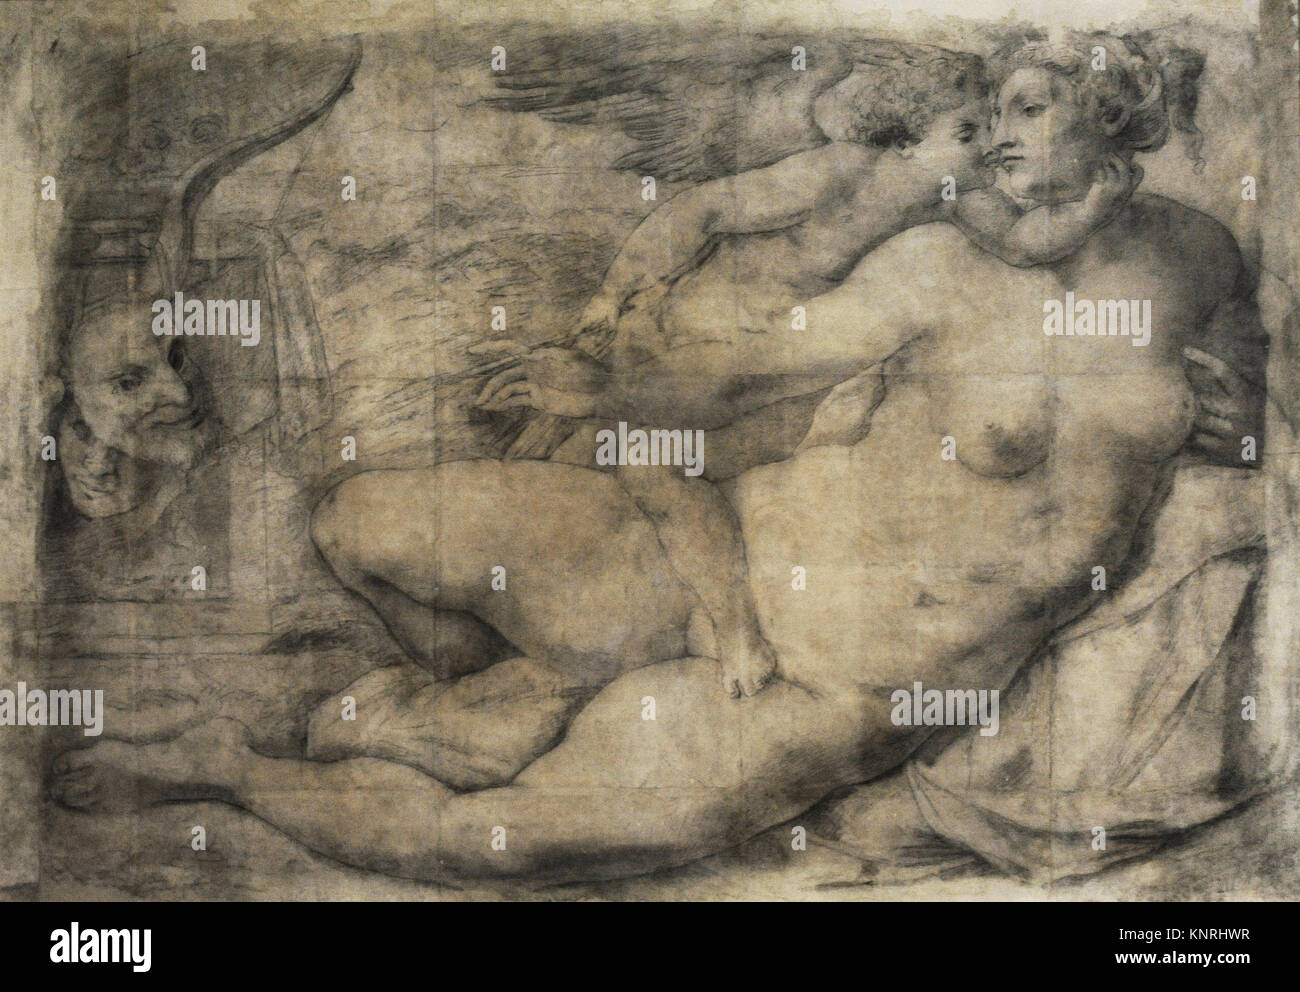 Michelangelo (Michelangelo Buonarroti) (1475-1564). Italian painter. Venus with Love, 1534. Charcoal drawing. Farnese - Stock Image